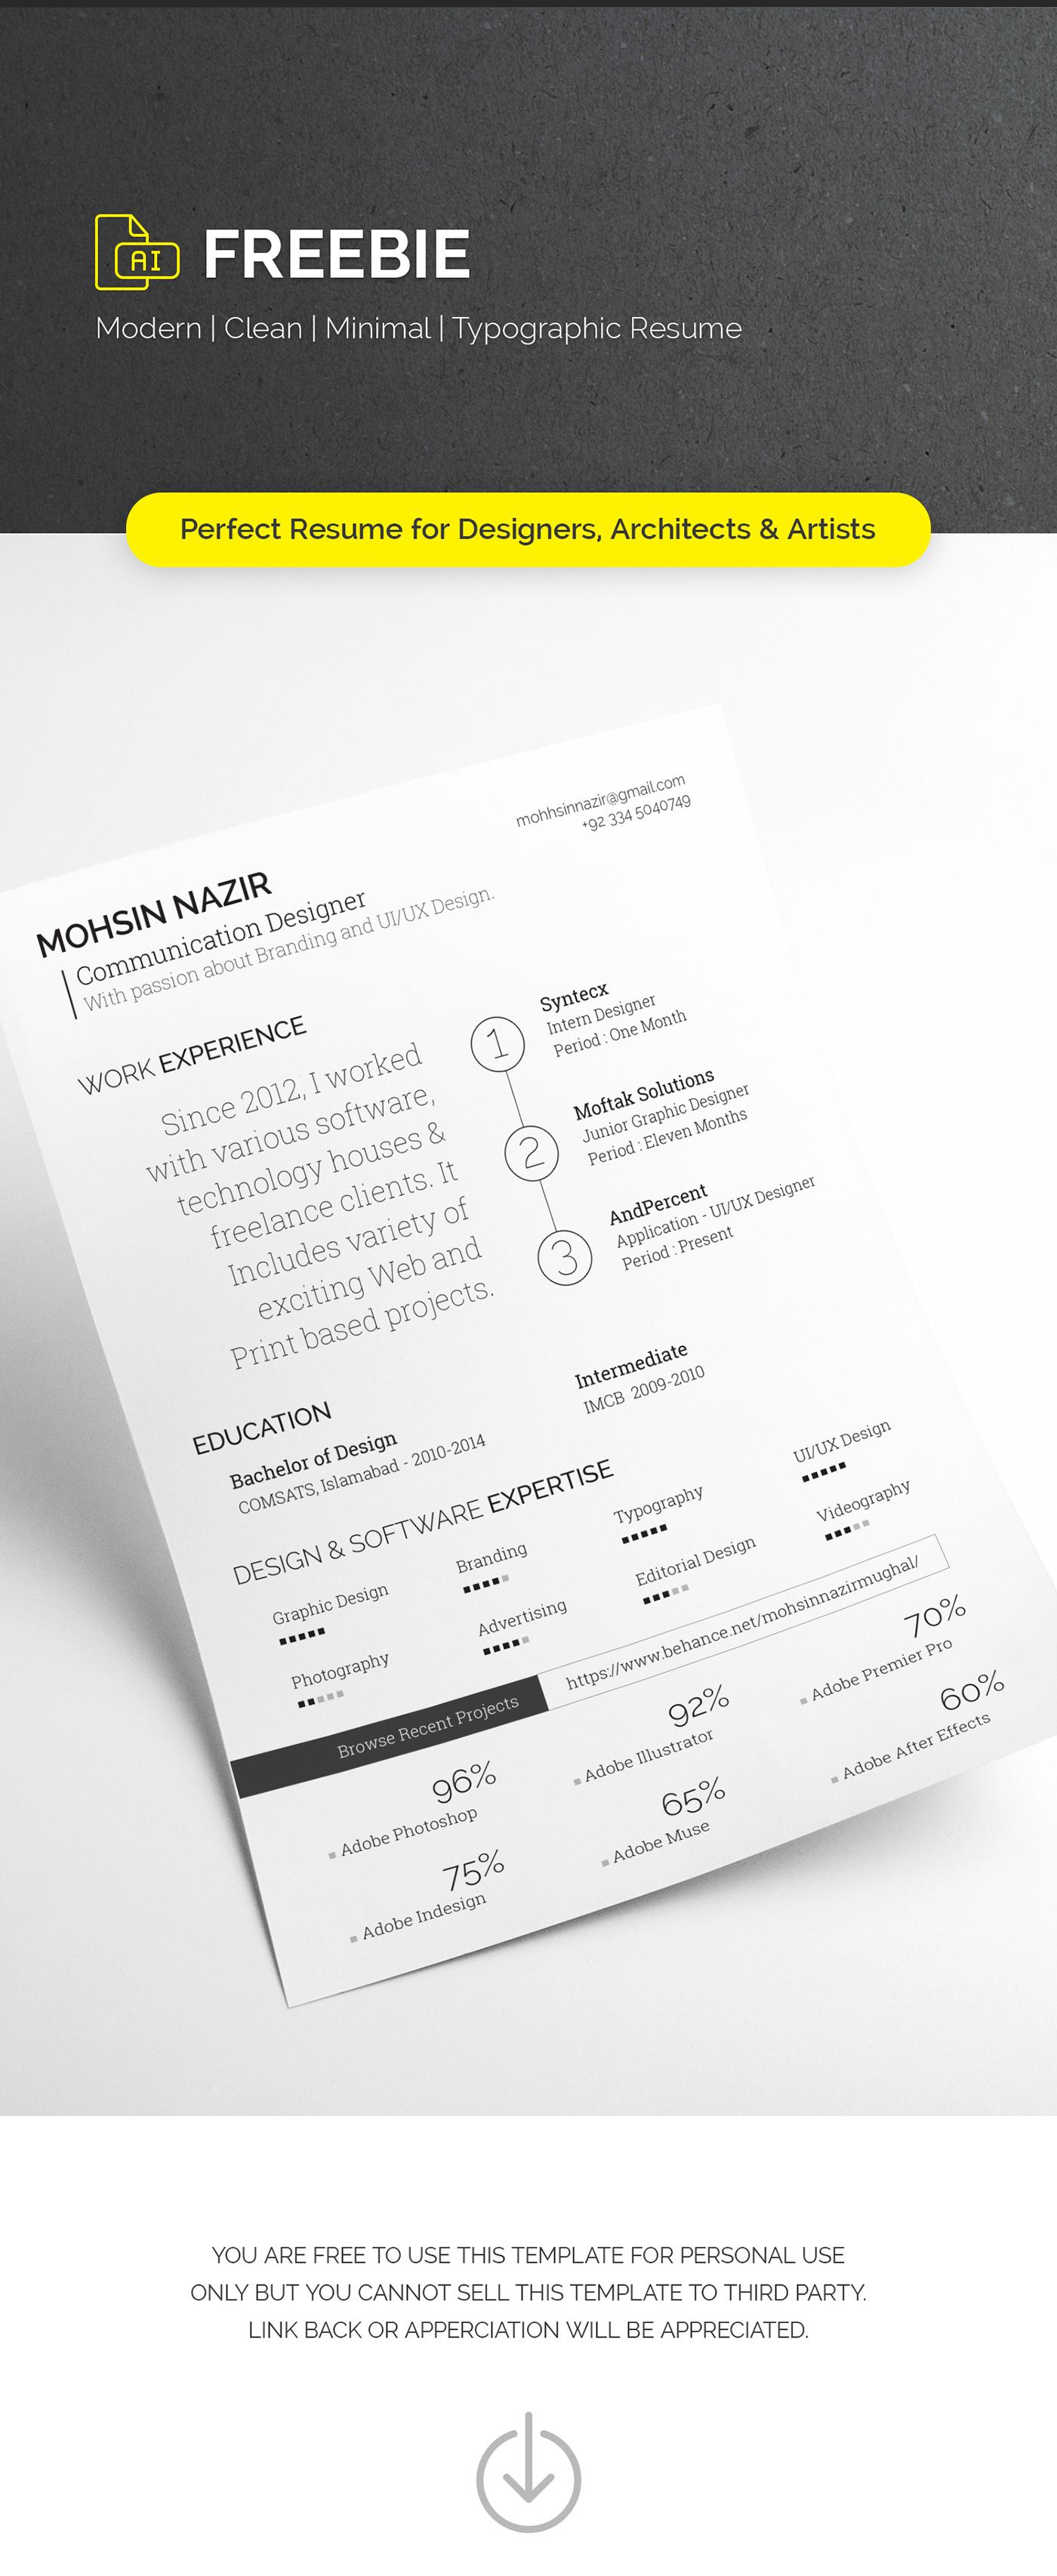 Personal Resume,Resume,Designer resume,inspirational resume,CV,artist resume,Free Resume,download,free cv,Minimal Resume,typographic resume,clean resume,Modern Resume,resume 2024,Download free reume